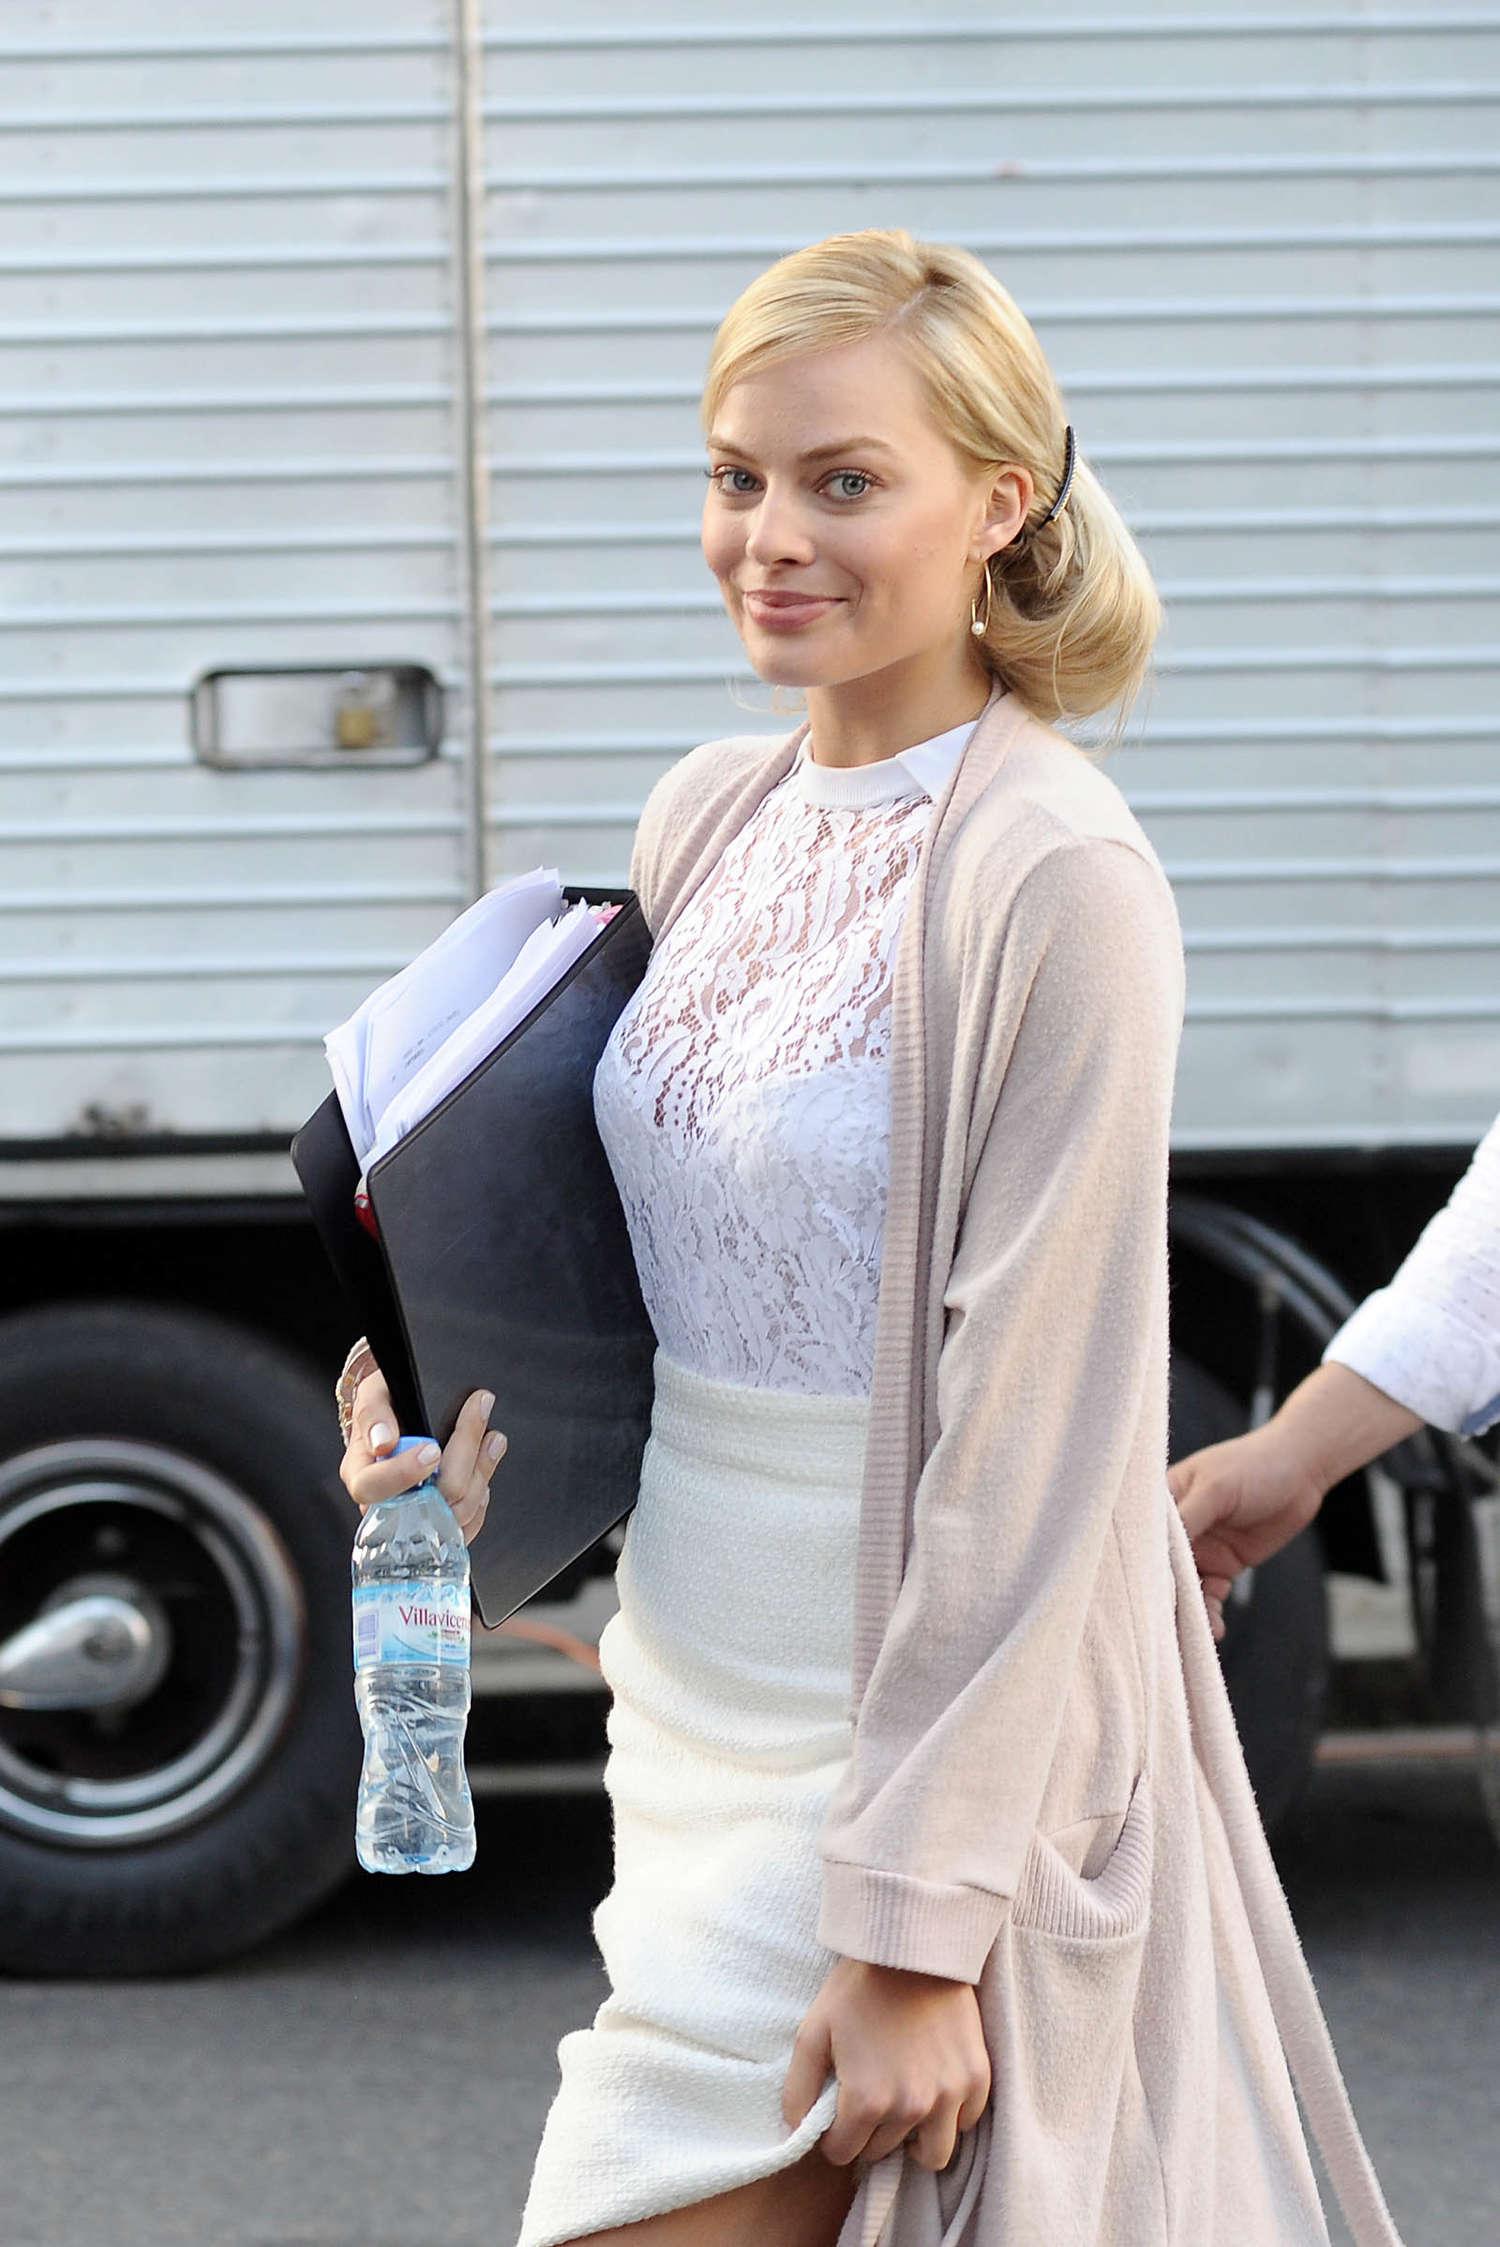 Margot Robbie Filming Focus In Argentina GotCeleb